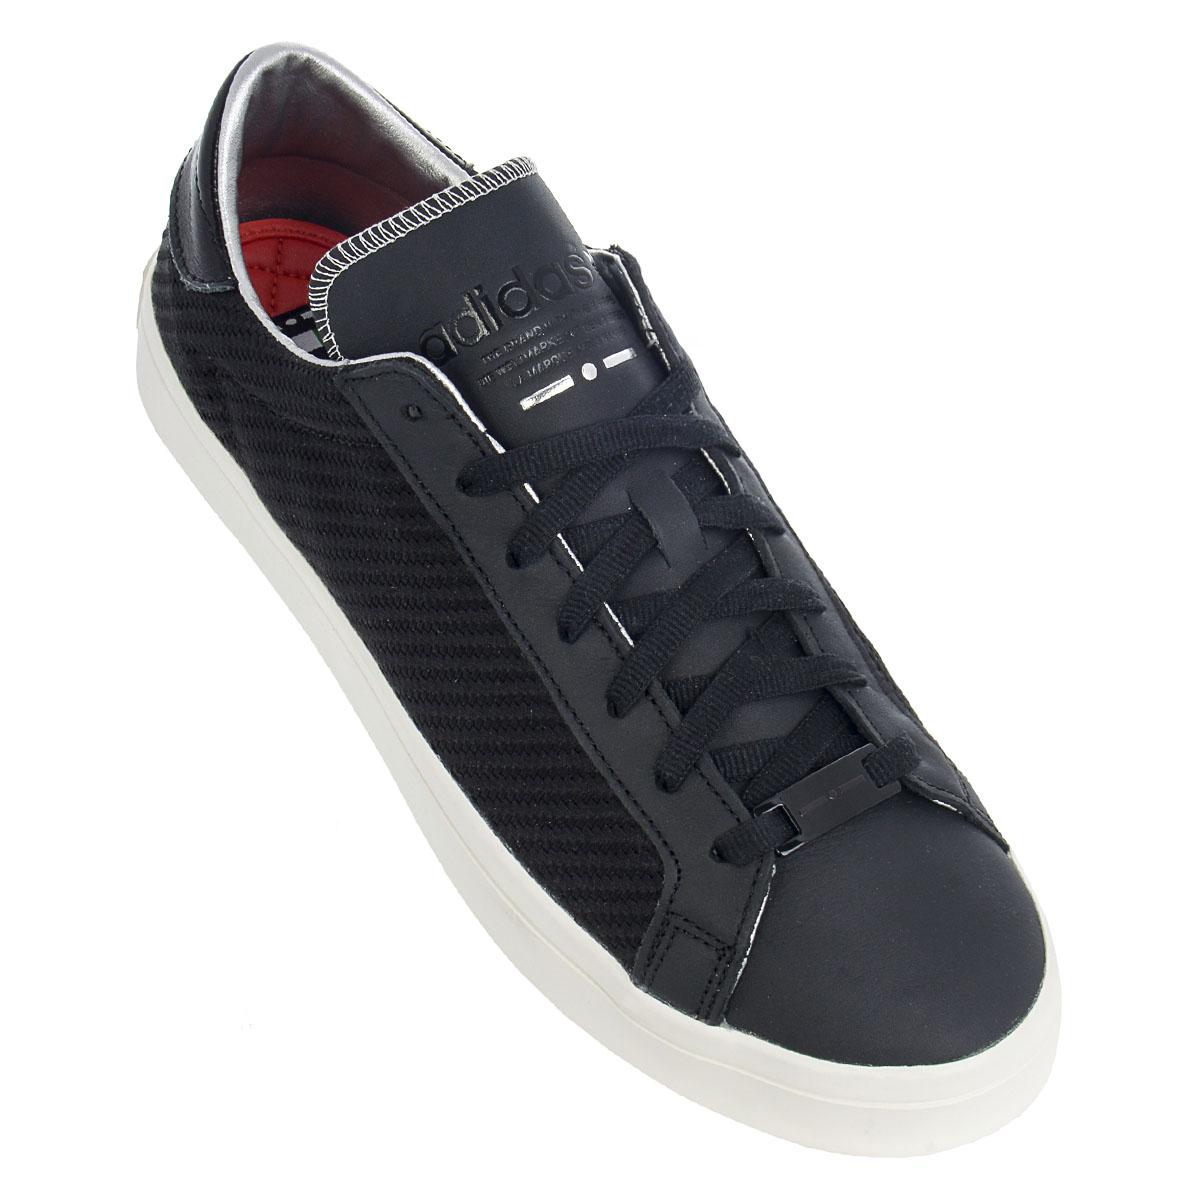 4a56d25f6f1e NEW adidas Court Vantage AQ5462 Men  s Shoes Trainers Sneakers SALE ...